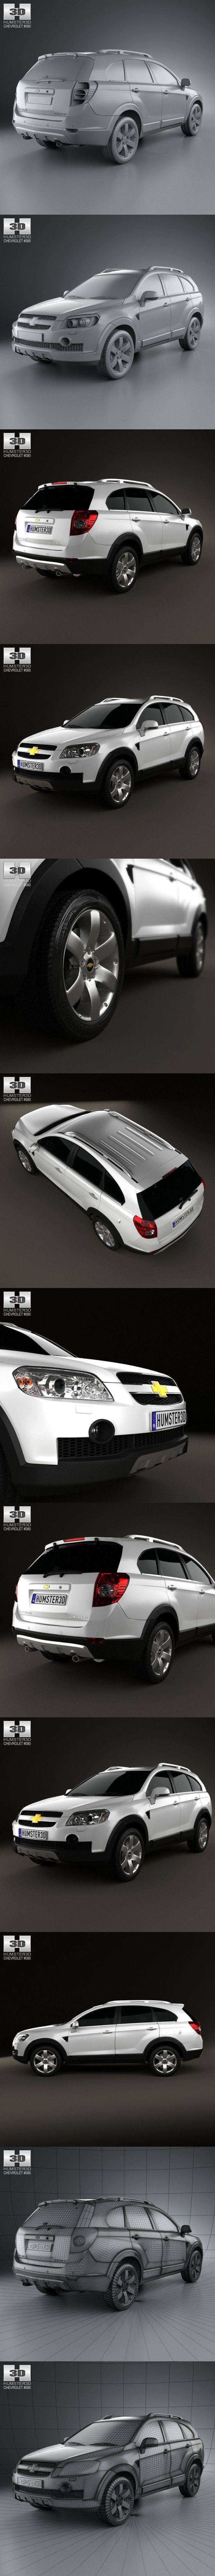 Chevrolet Captiva 2010 #chevrolet #chevroletcaptiva